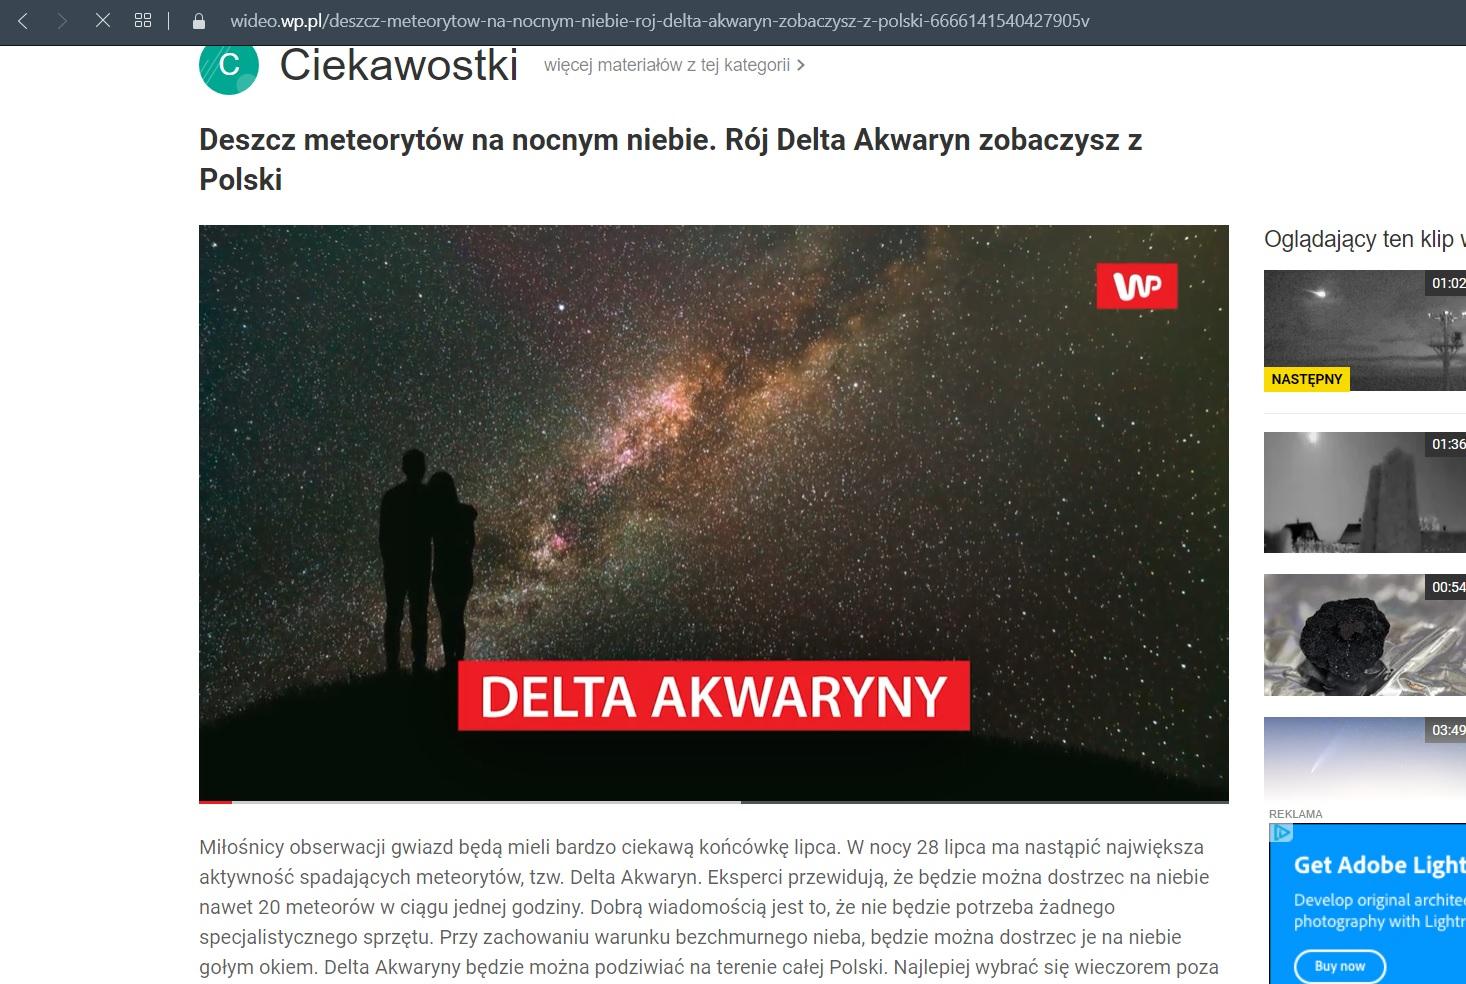 delta akwaryny.jpg